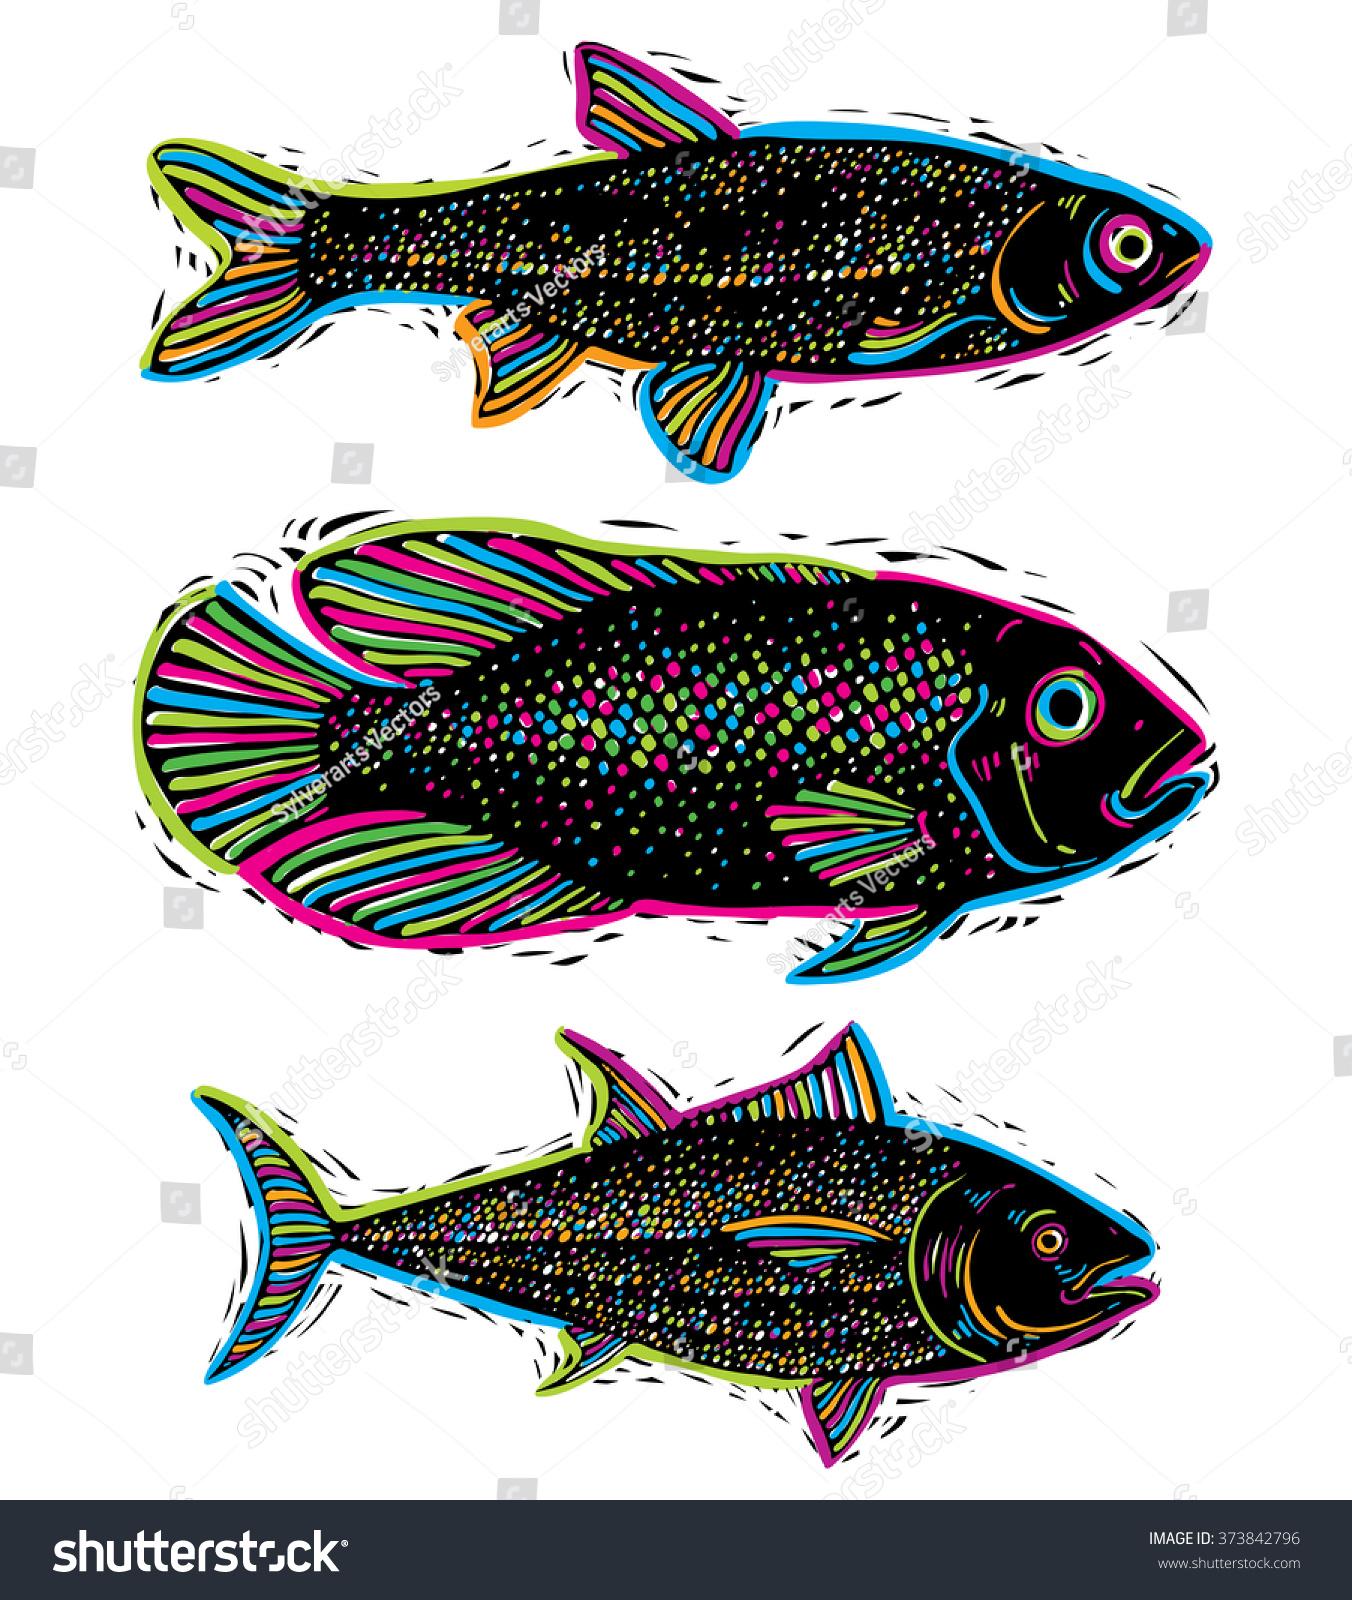 Underwater symbols for Dream interpretation fish